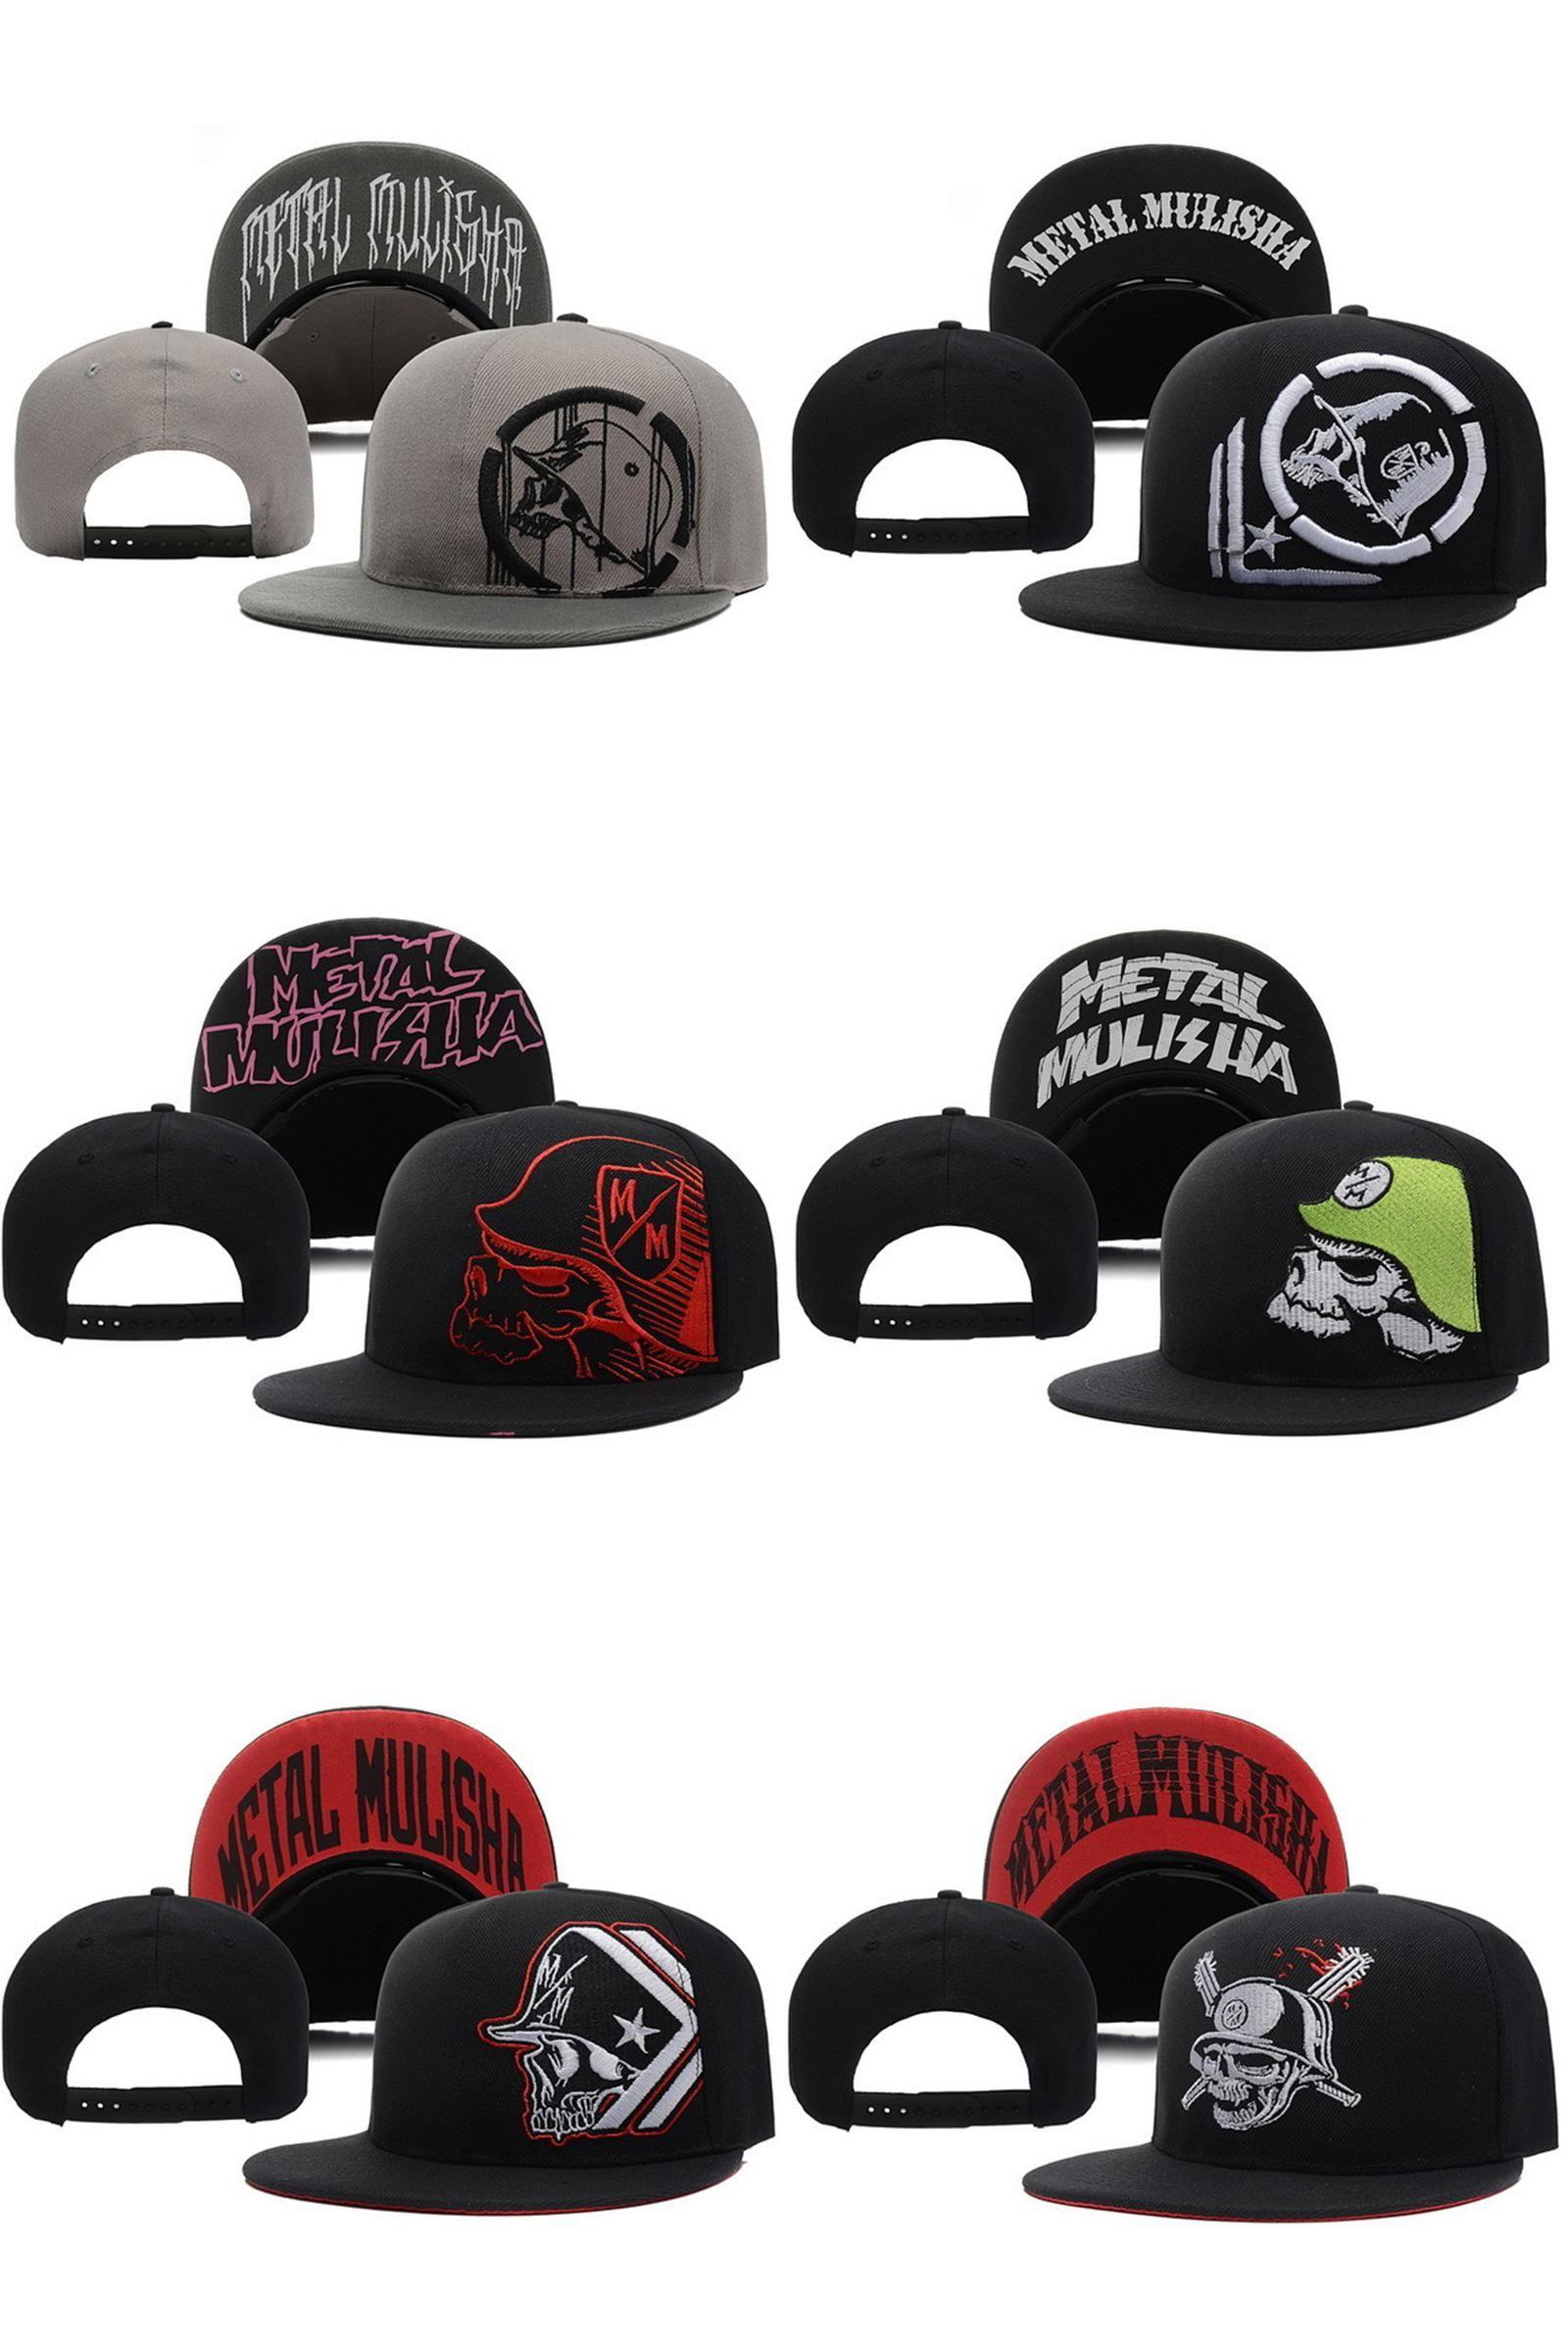 0f9c53d05ee  Visit to Buy  2016 Fashion Metal Mulisha Baseball Hat Best Quality Brand  Snapback Cap For Men Women Free Shipping  Advertisement